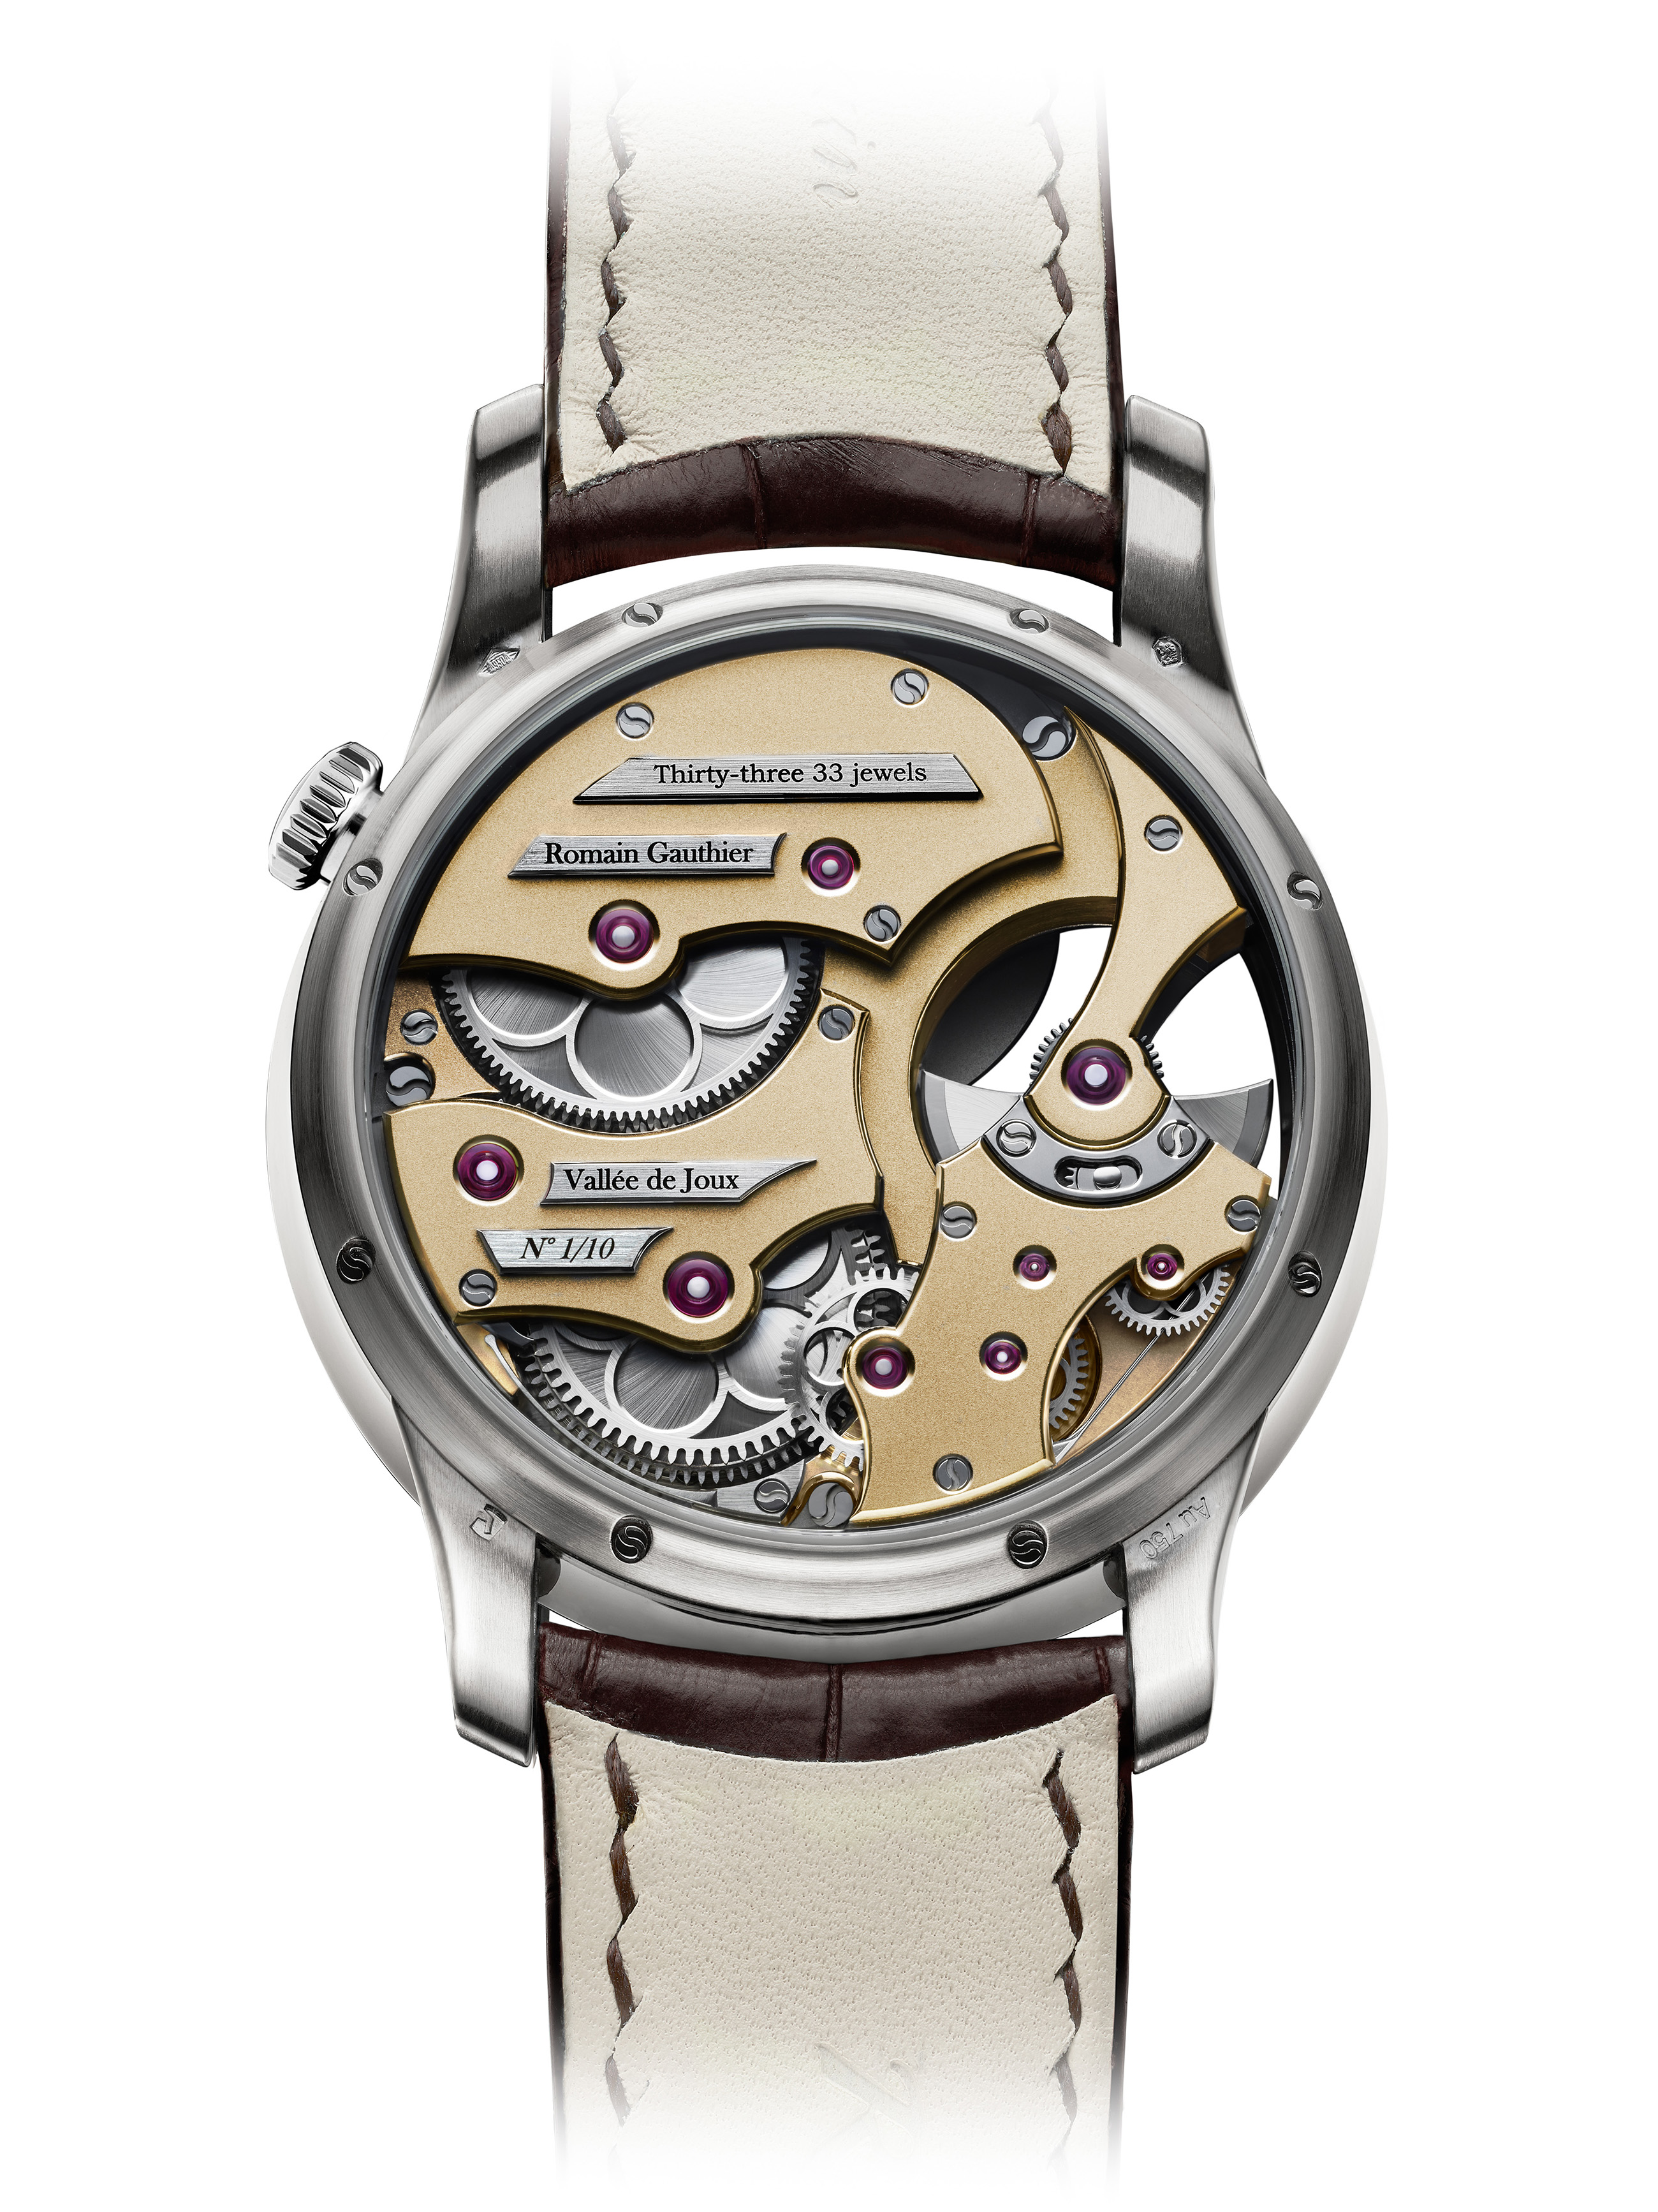 Romain_Gauthier_Insight_Micro-Rotor_white_gold_white_enamel_dial_6